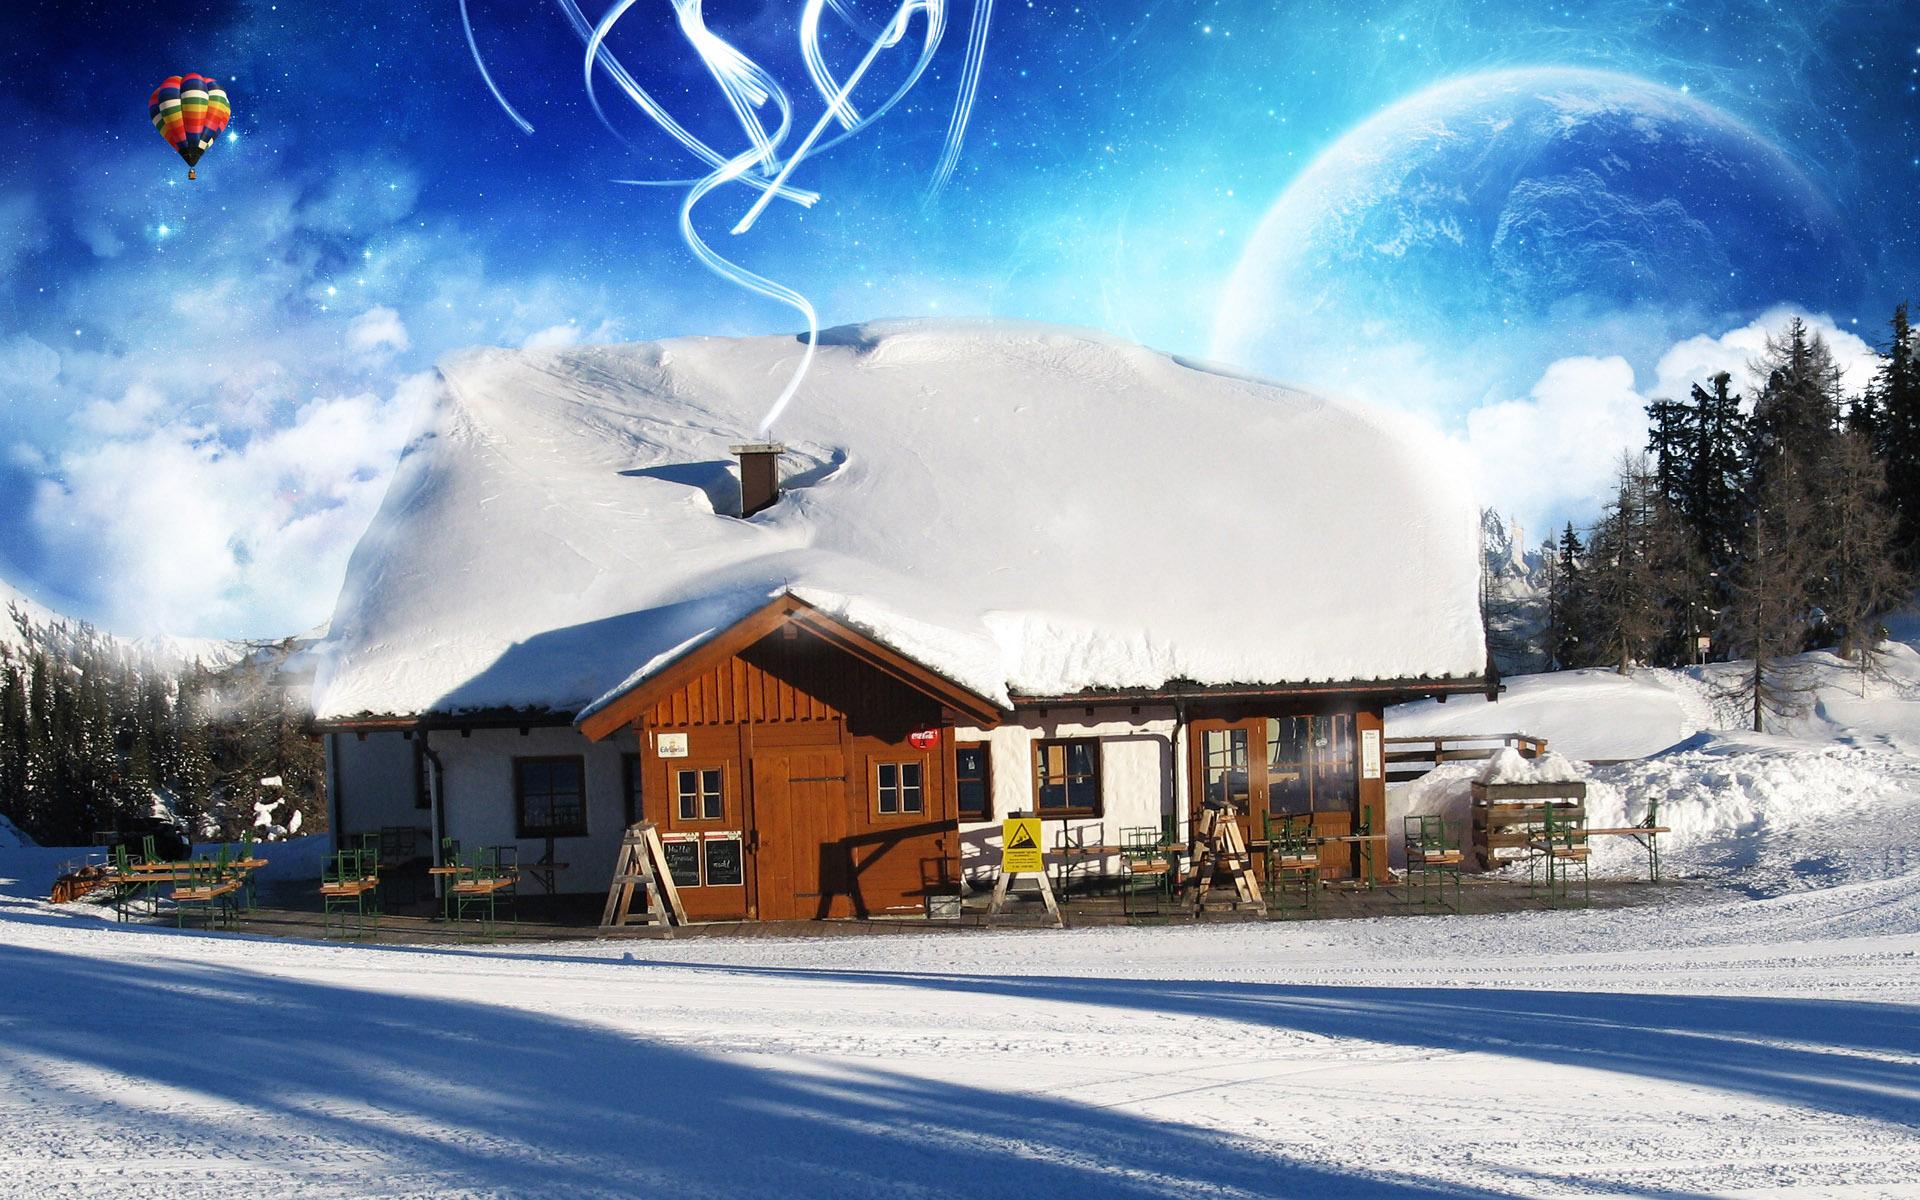 süße Natur 3d hd - home sweet home ...